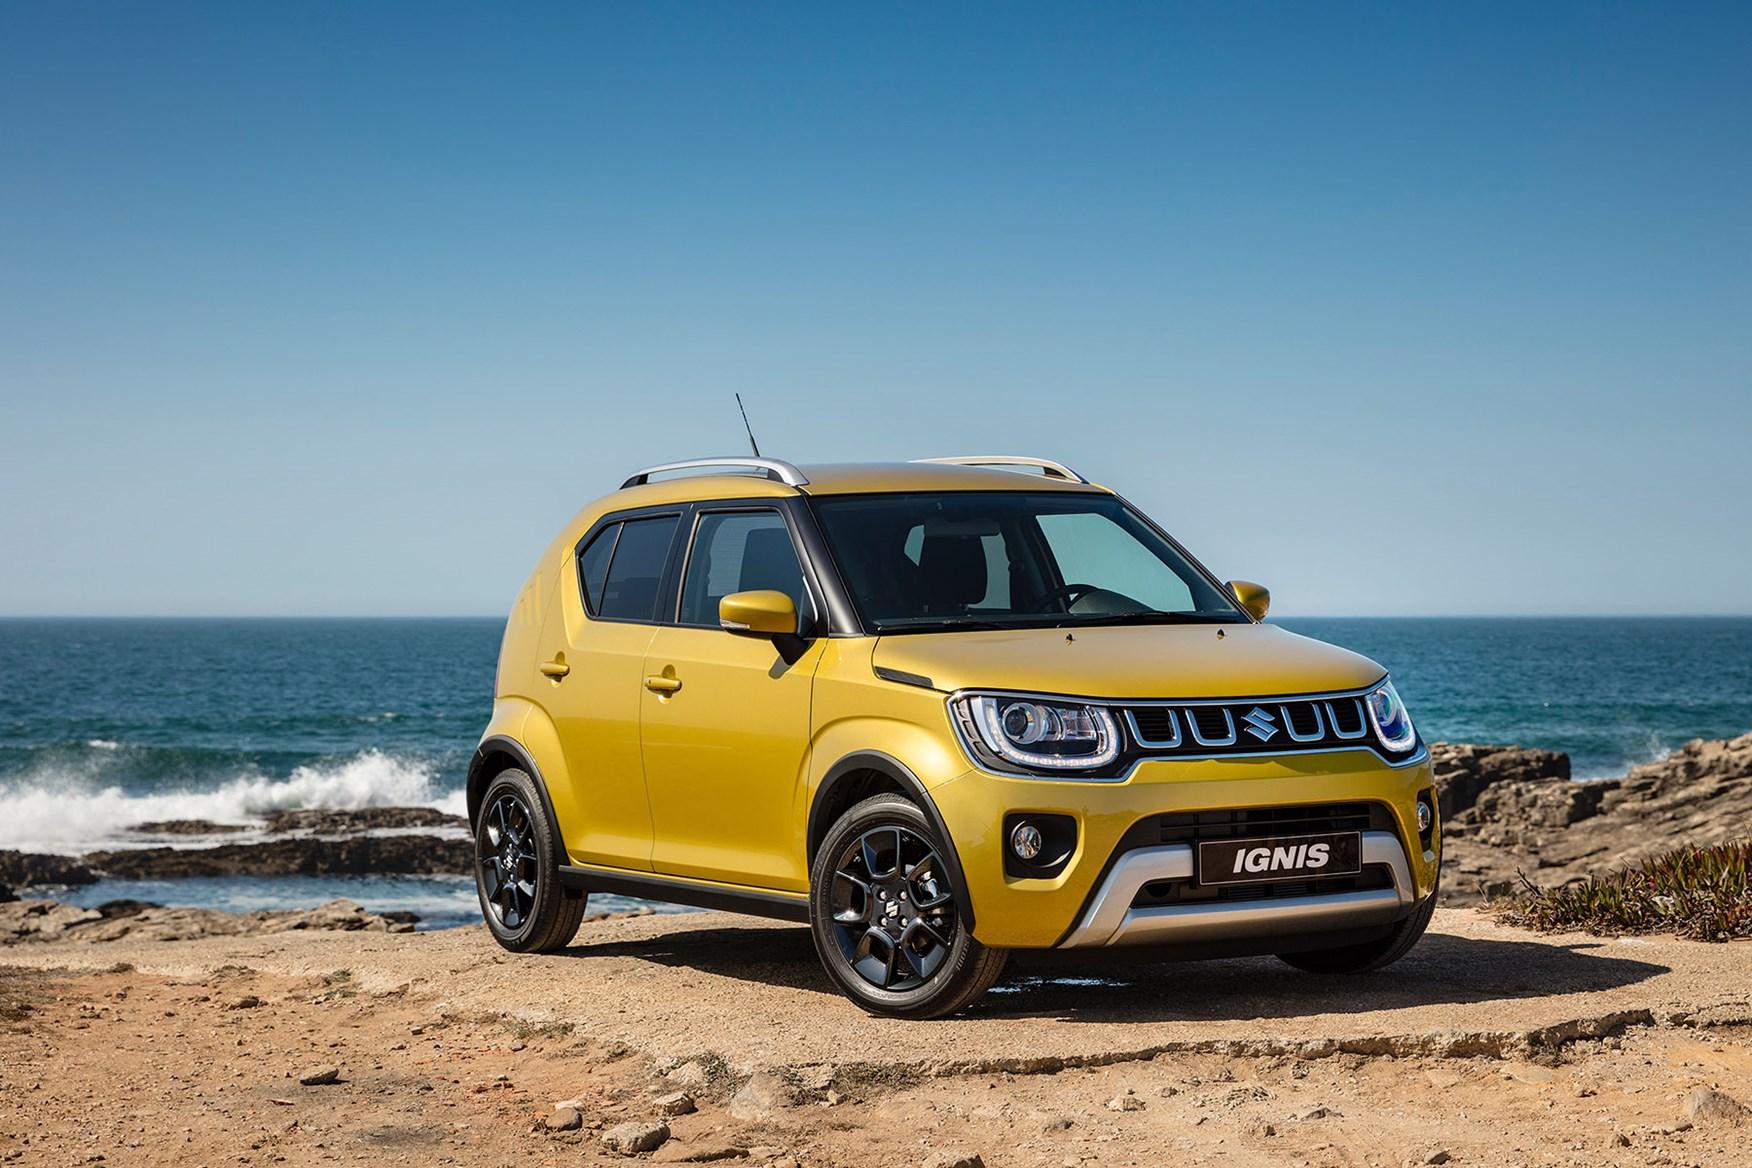 Suzuki Vitara Owner Reviews: MPG, Problems & Reliability